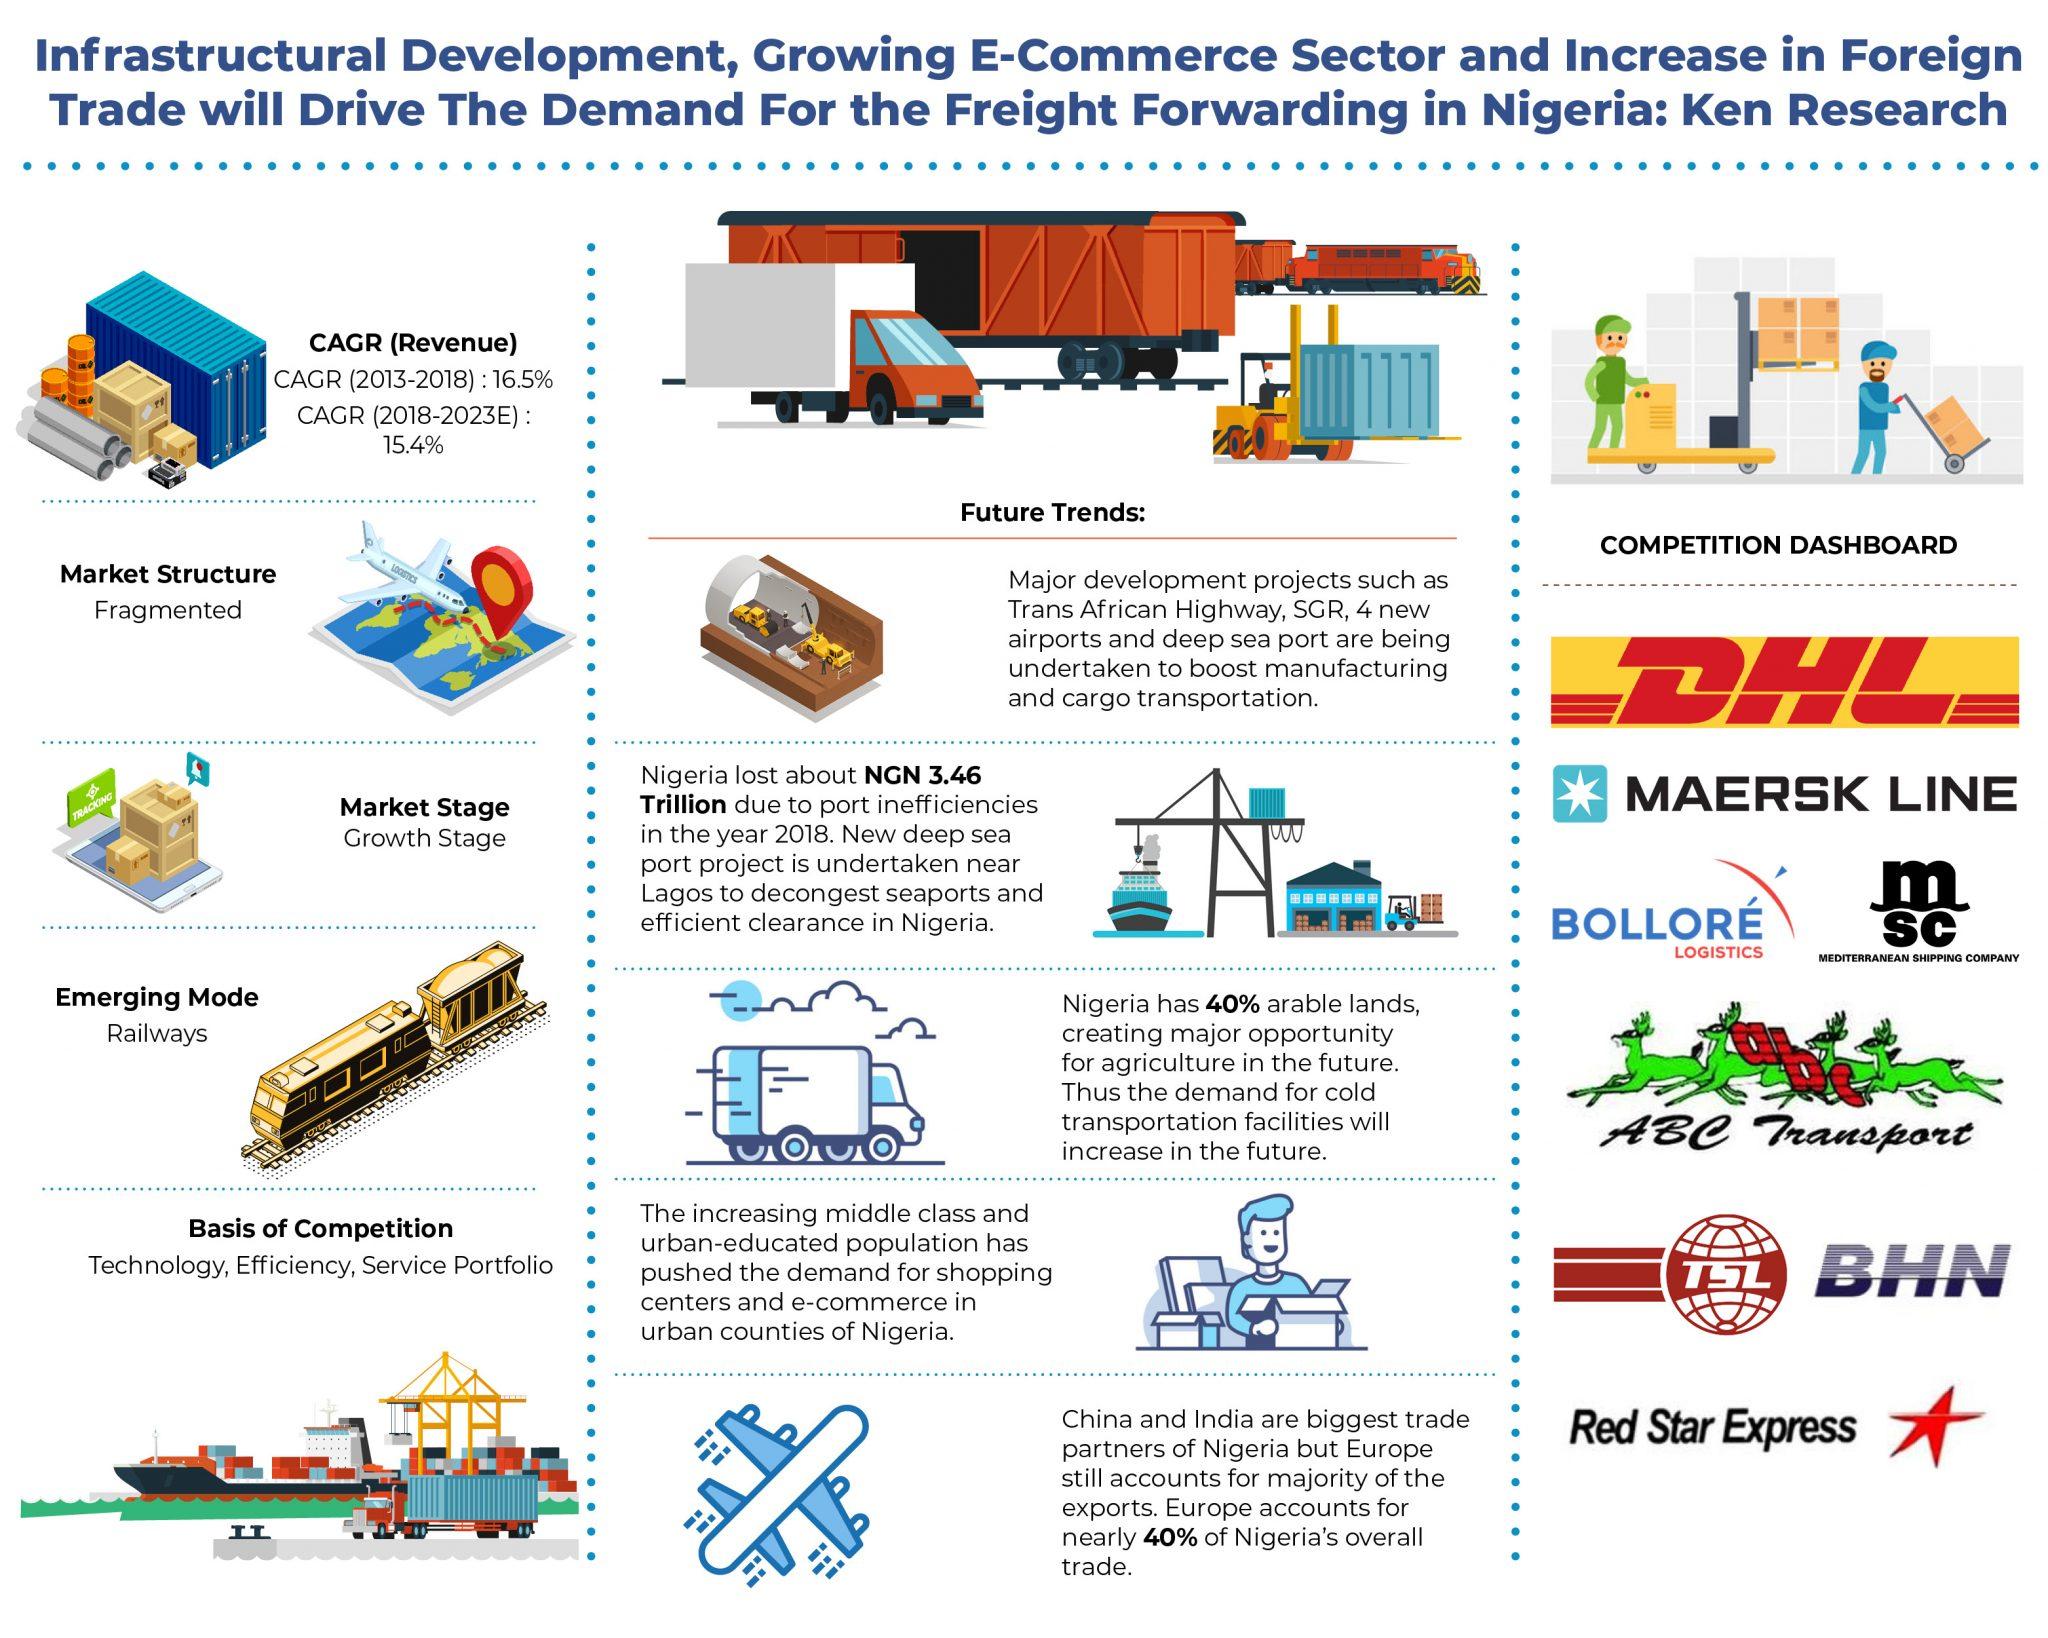 Nigeria-Freight-Forwarding-Market.jpg